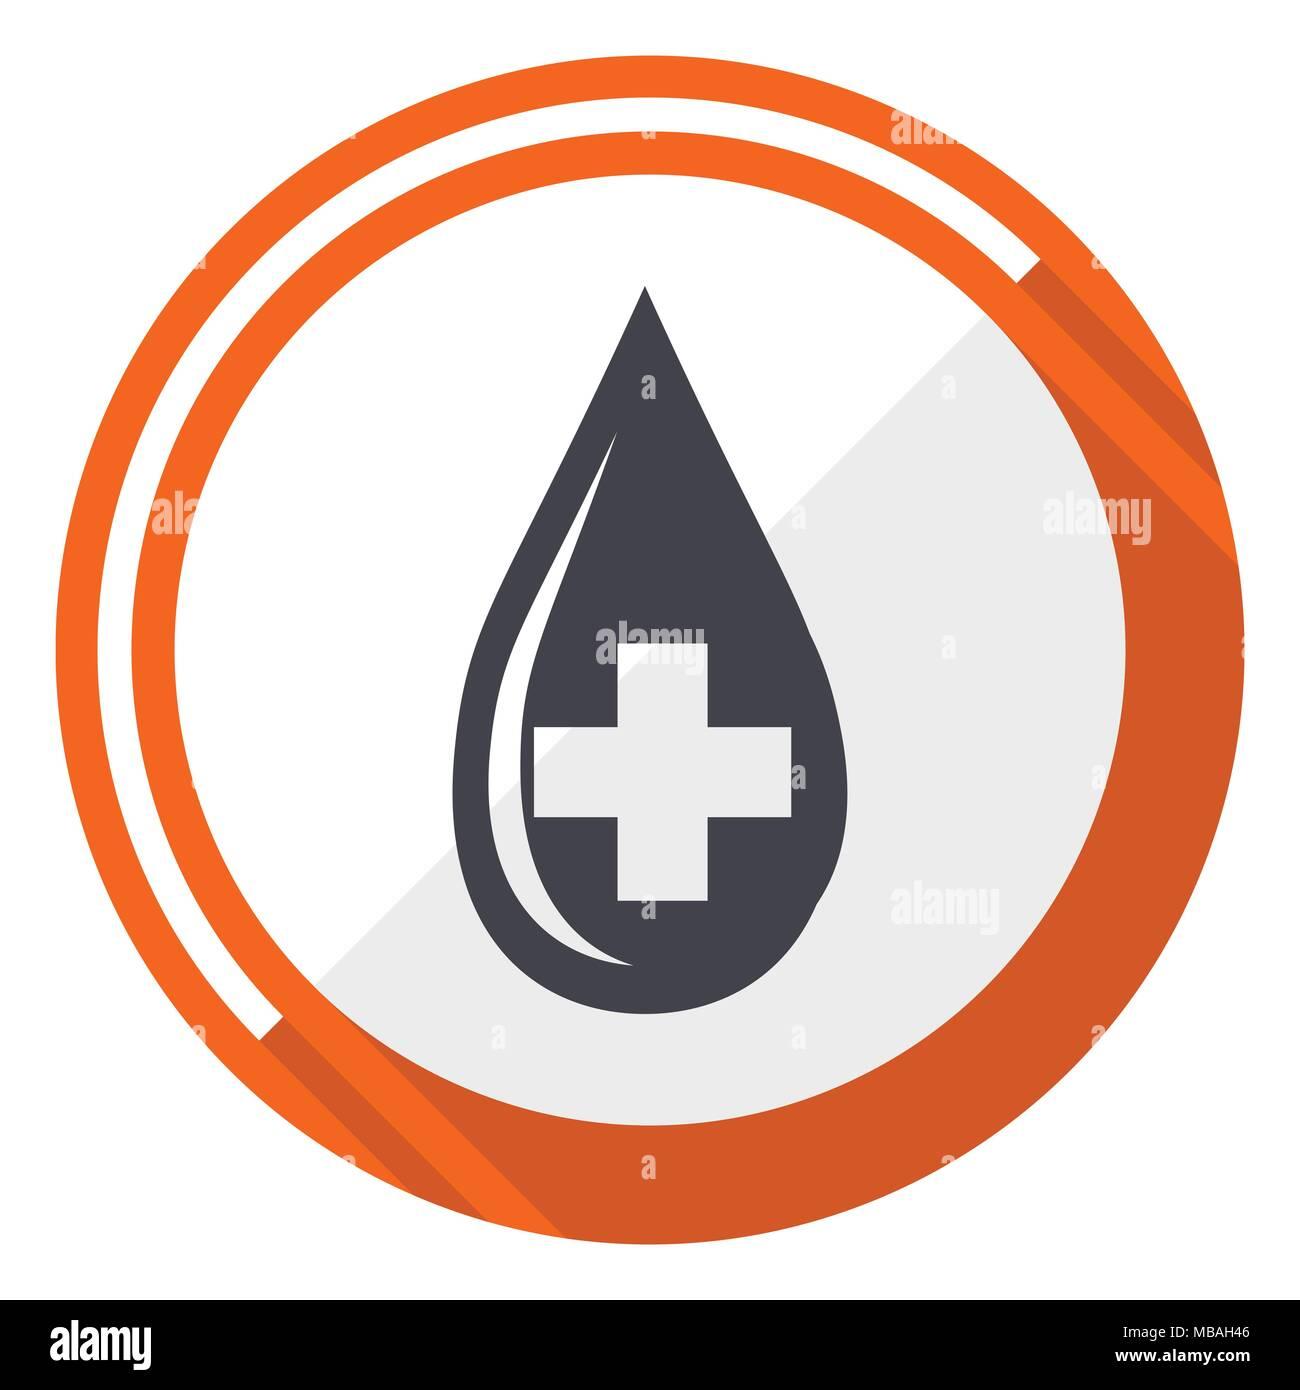 Blood test logo vector icon stock photos blood test logo vector blood flat design vector web icon round orange internet button isolated on white background buycottarizona Images